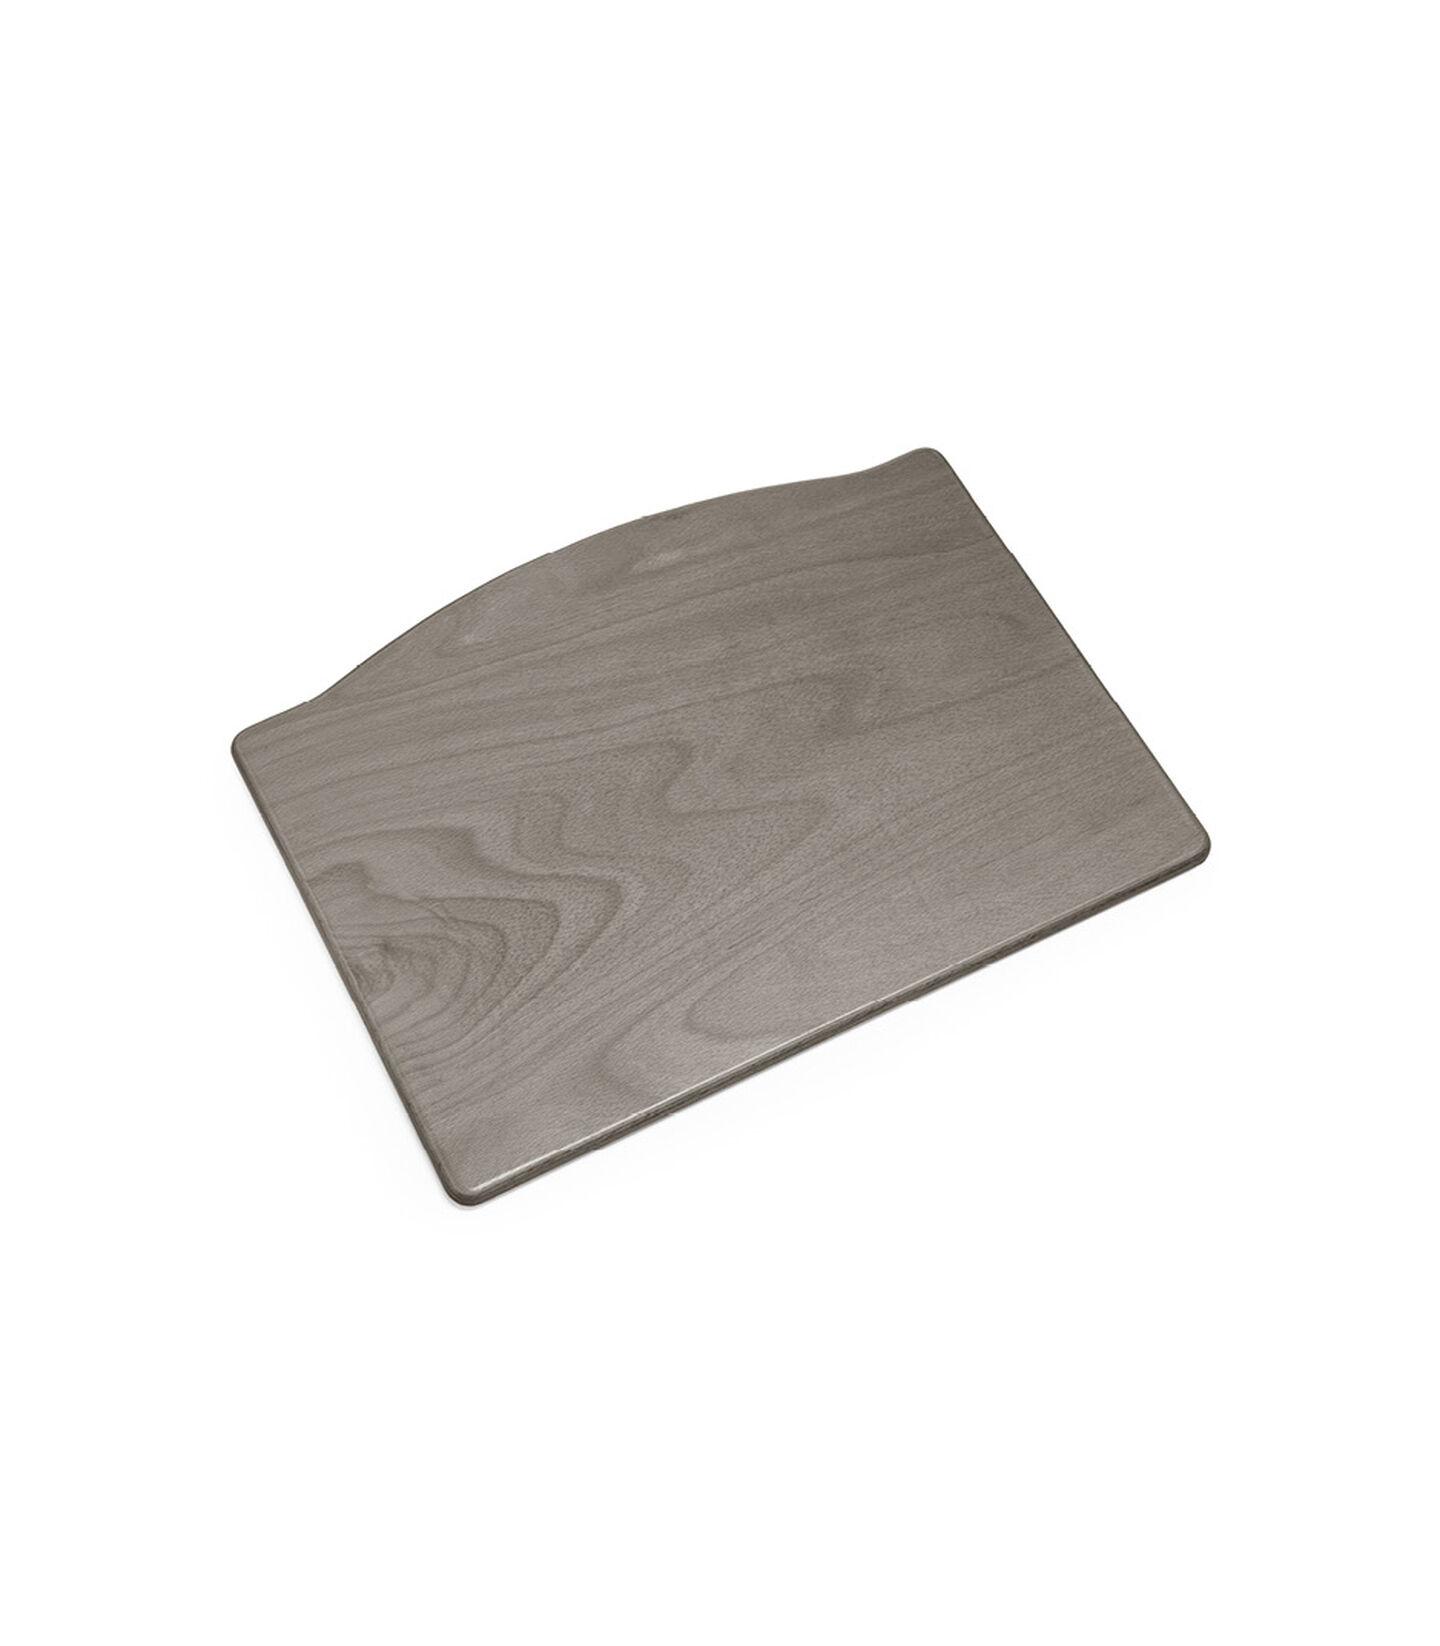 Tripp Trapp® Footplate Hazy Grey, Hazy Grey, mainview view 1